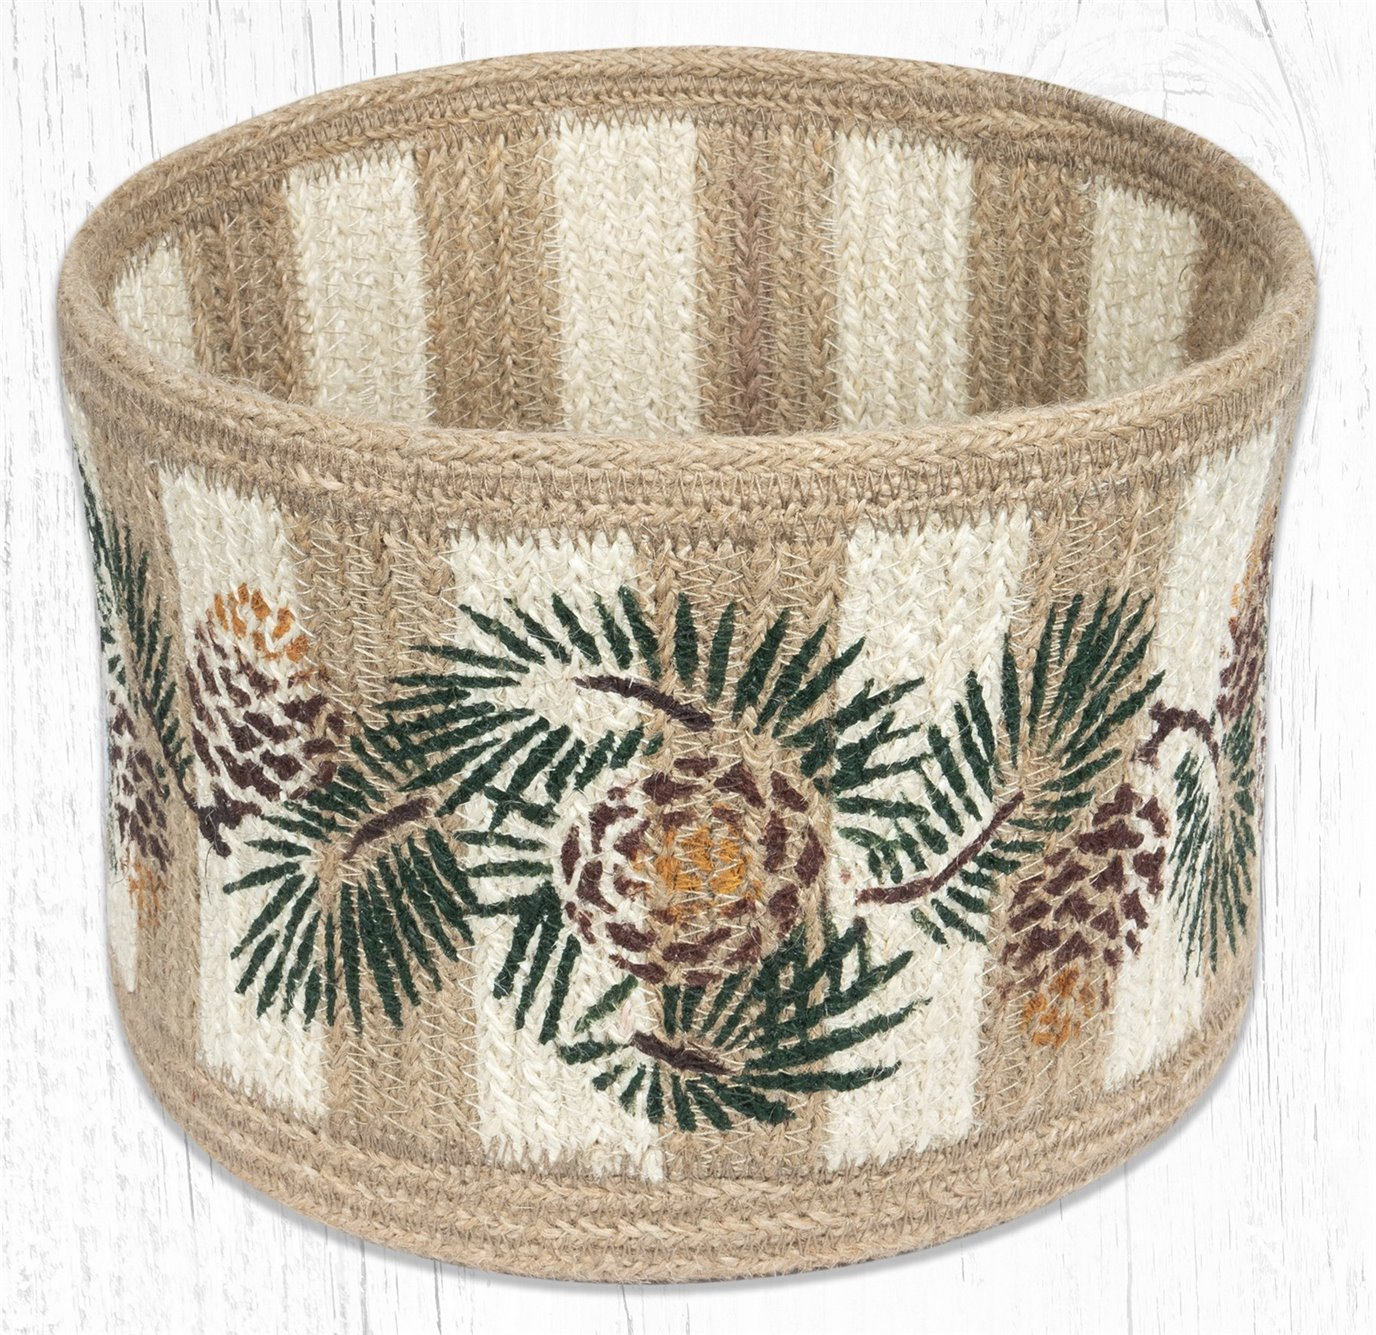 "Pinecone Natural Rope Braided Basket 9""x7"""